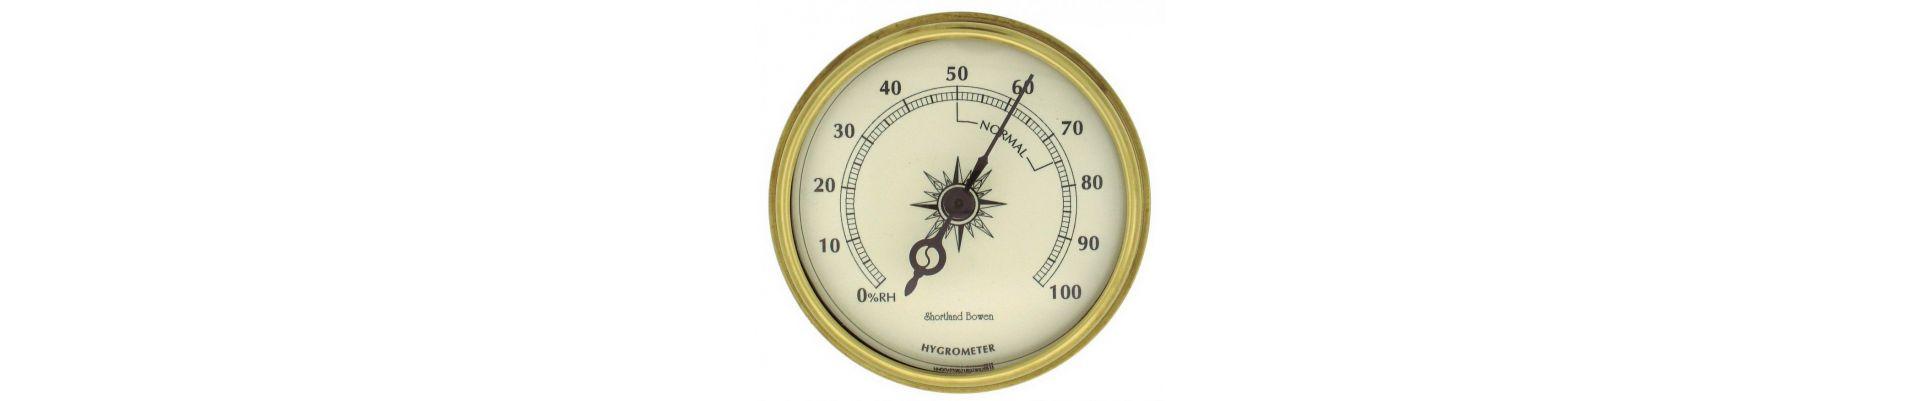 Higrometre trabucuri.Magazin hydrometre si umidometre pentru trabucuri